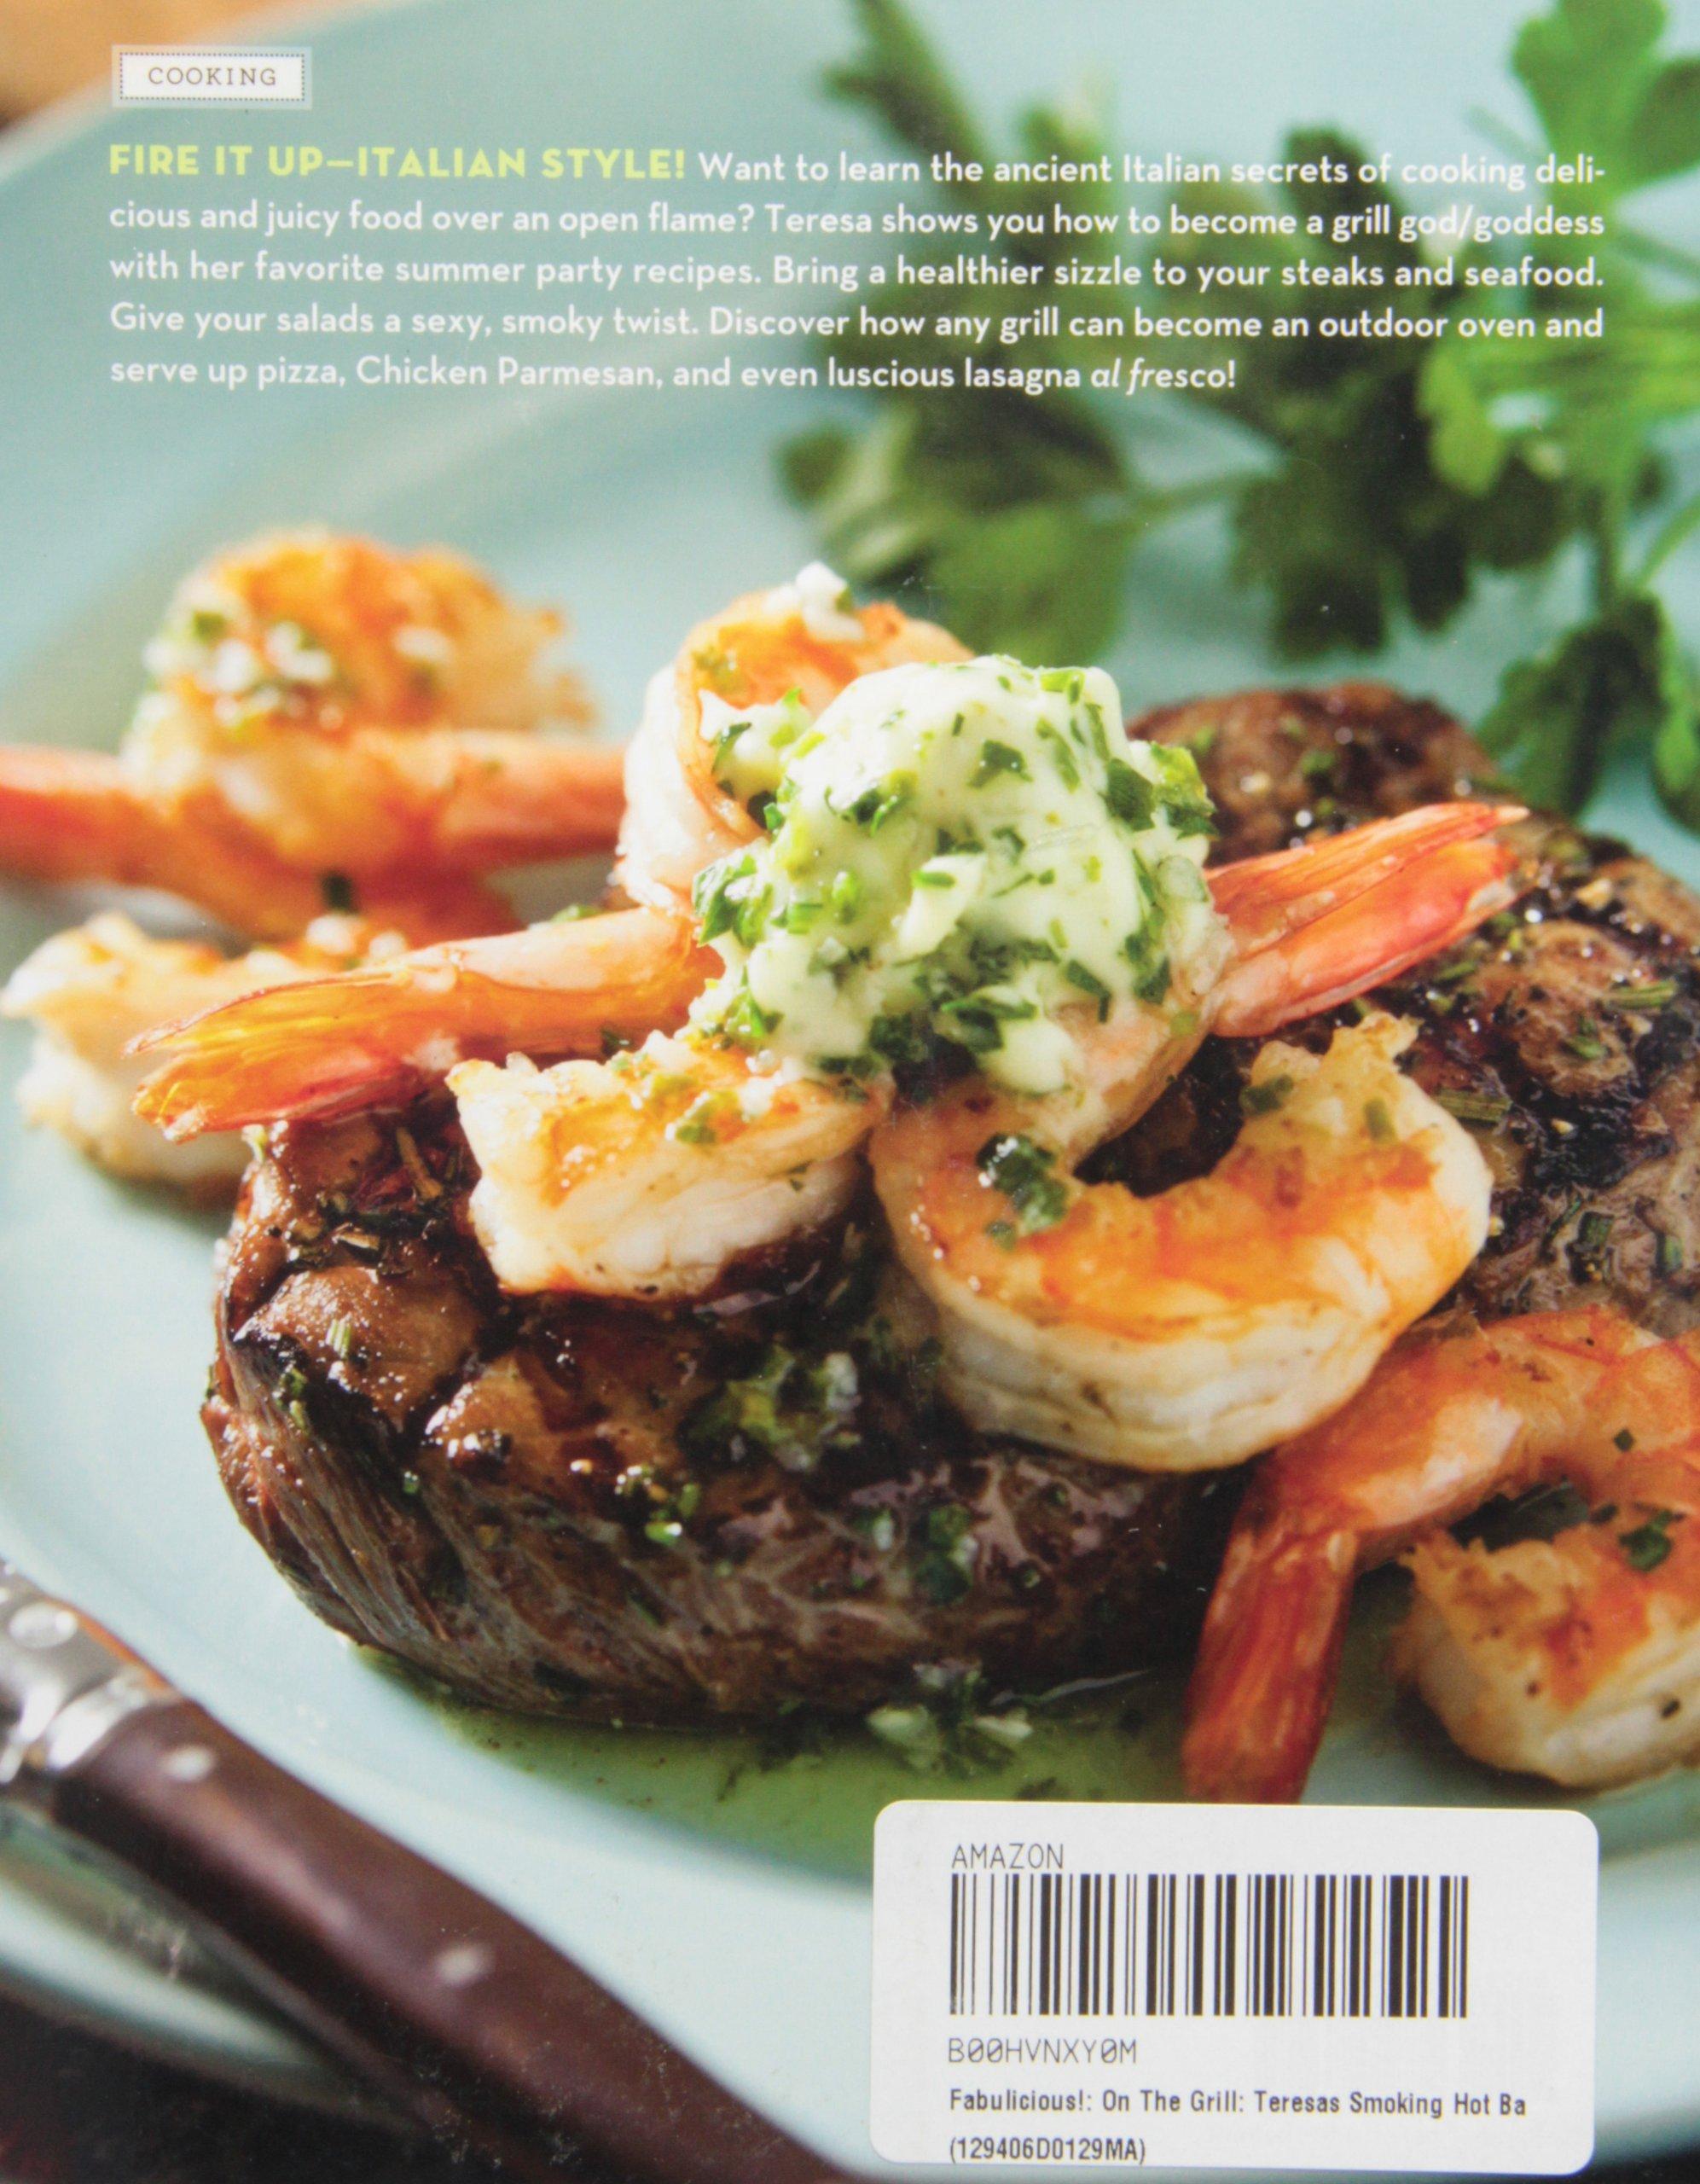 Fabulicious!: On the Grill: Teresa's Smoking Hot Backyard Recipes: Teresa  Giudice, Heather Maclean: Books - Amazon.ca